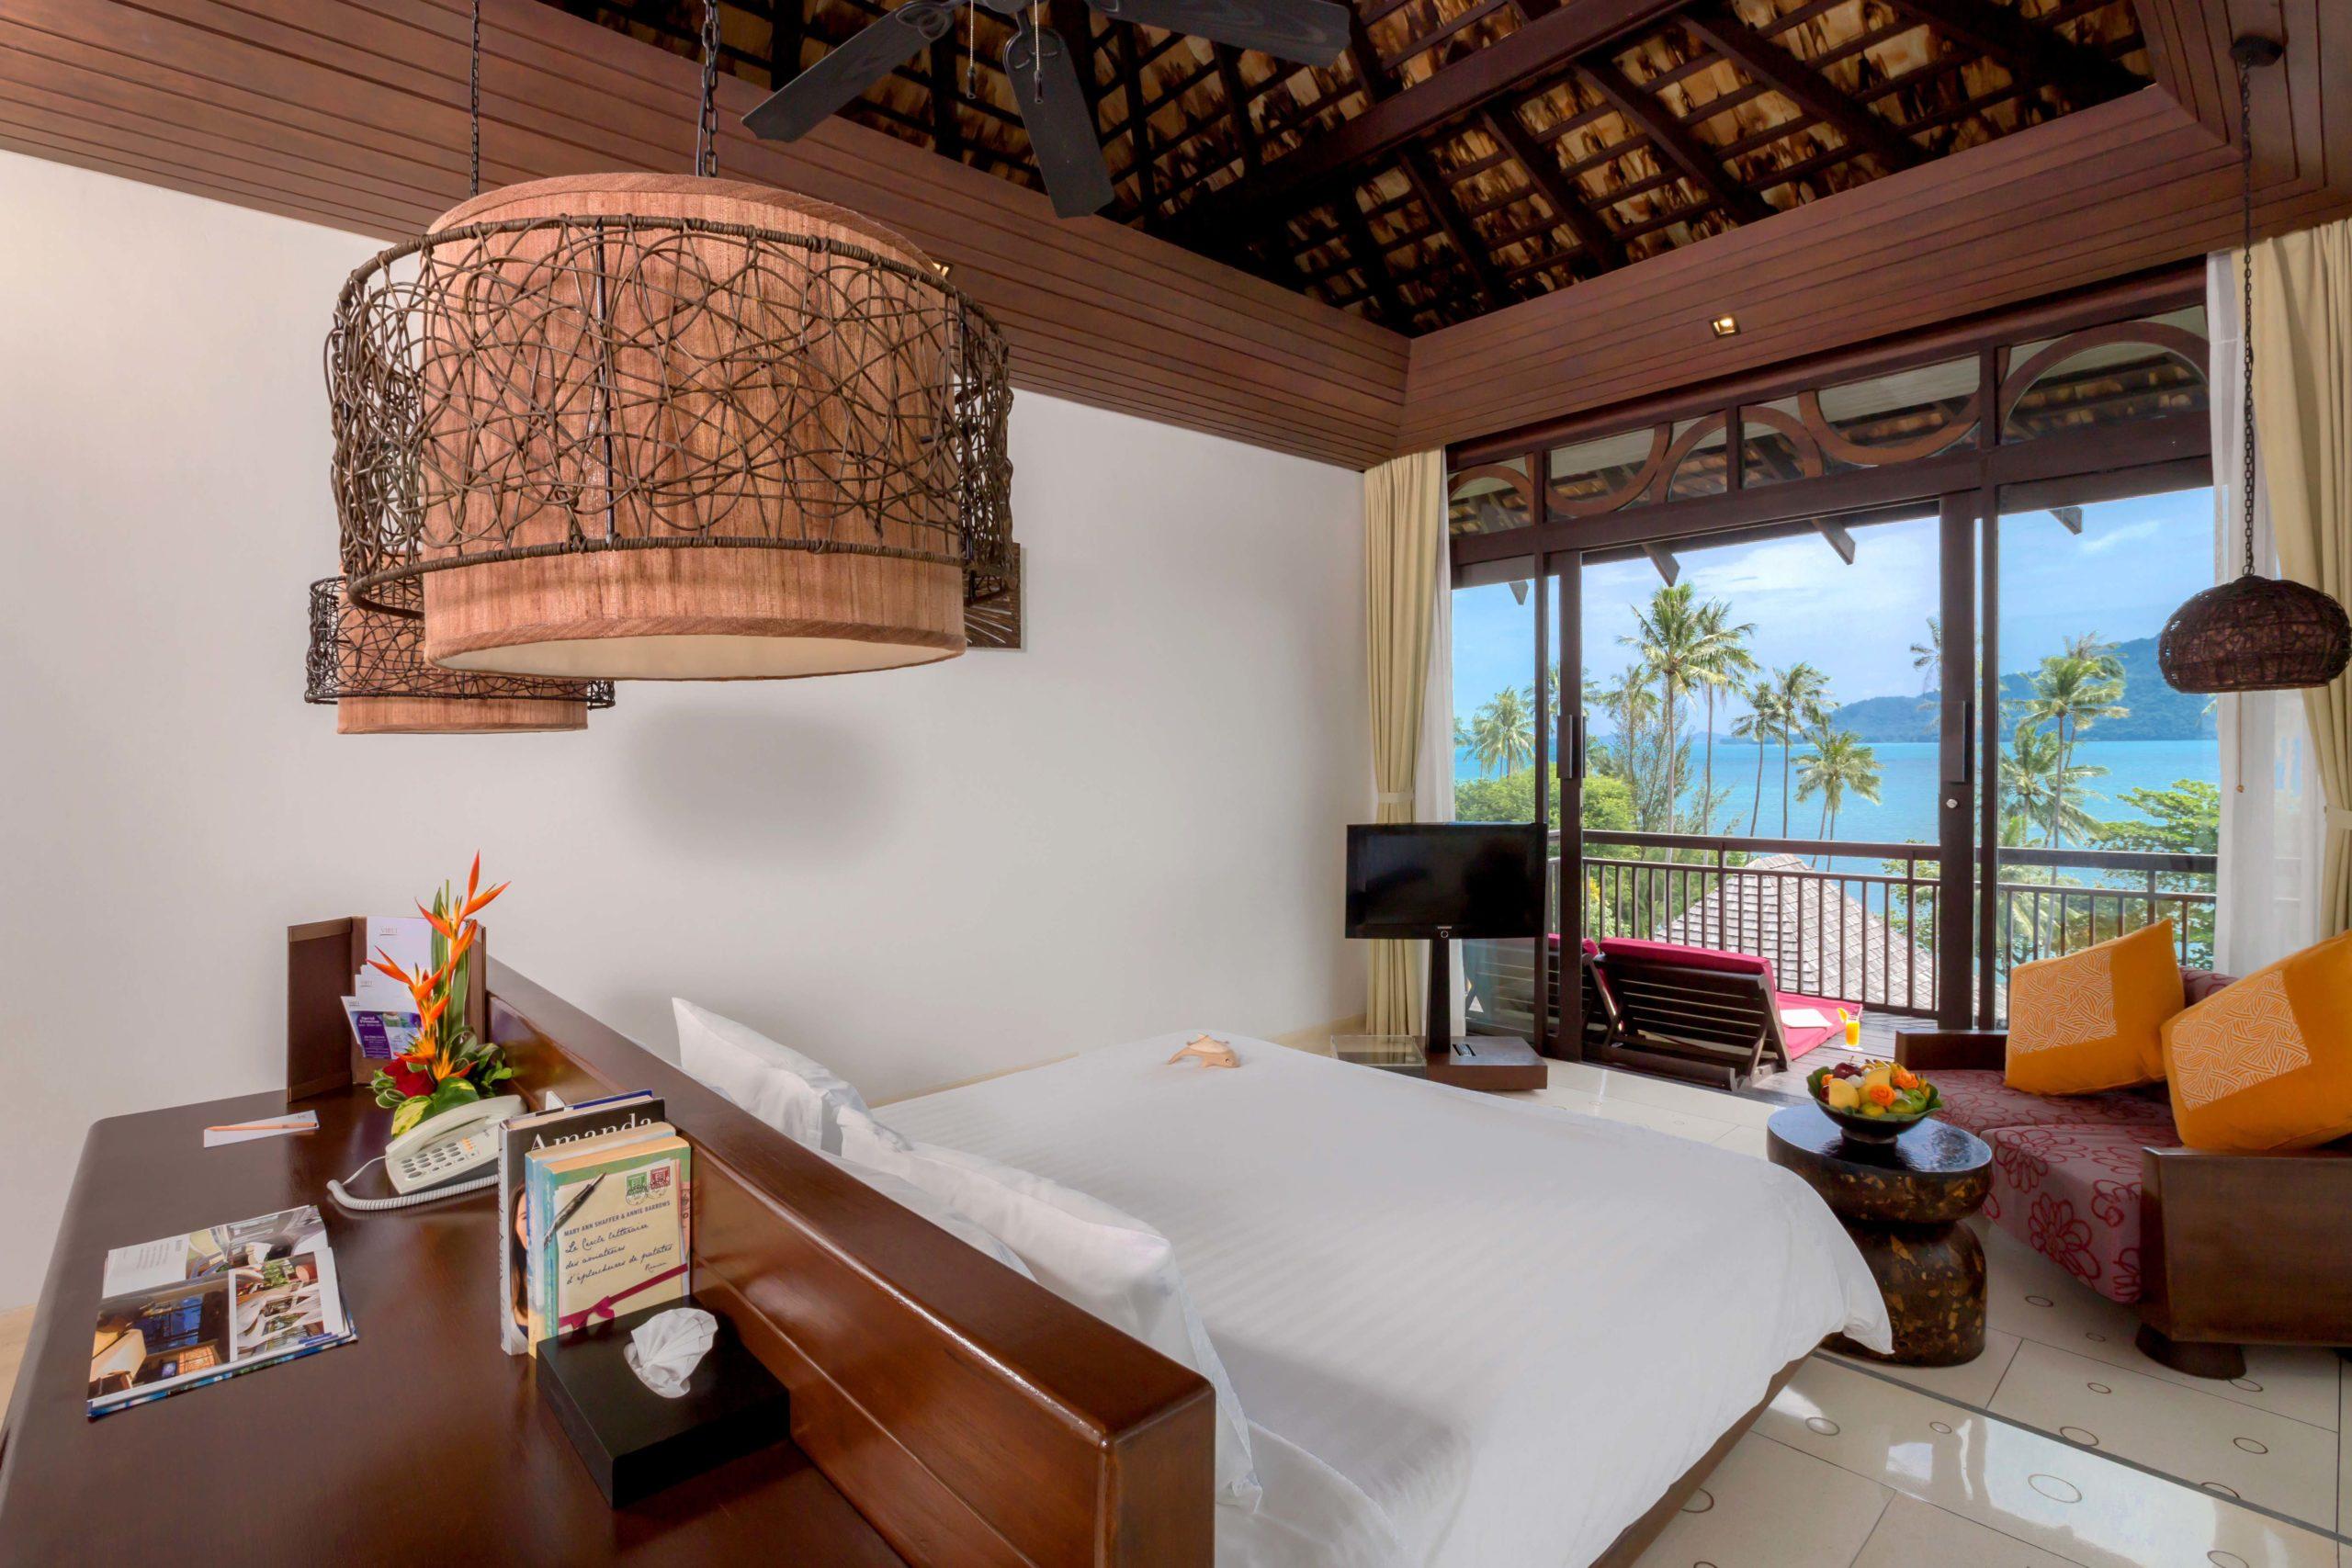 002_Deluxe Seaview Villa_Bedroom The Vijitt Resort Phuket